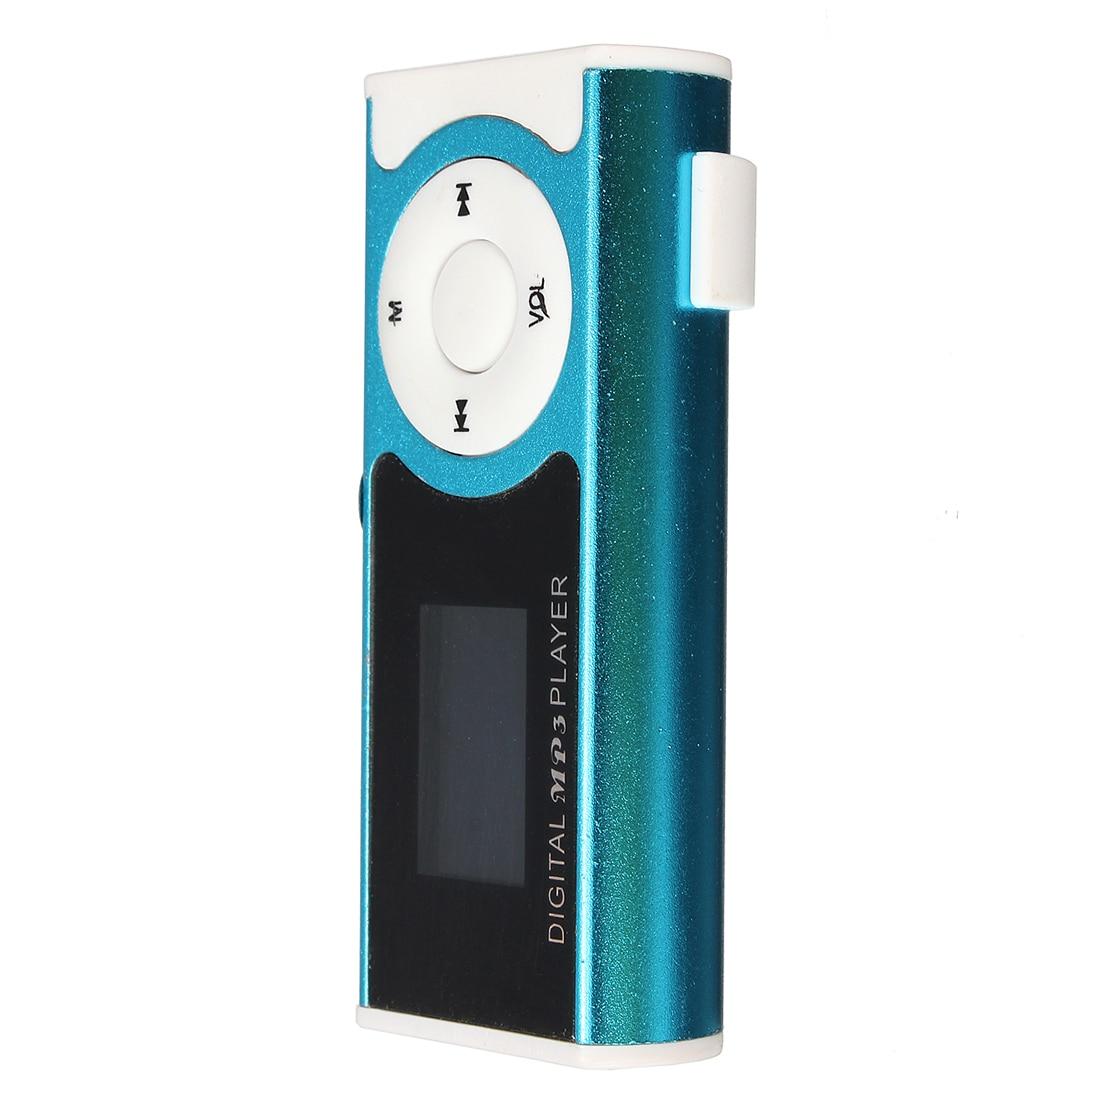 Hfes Mini Usb Clip-player Mp3-player Lcd-bildschirm 16 Gb Mini Sd Tf Karte Mp3-player Tragbares Audio & Video